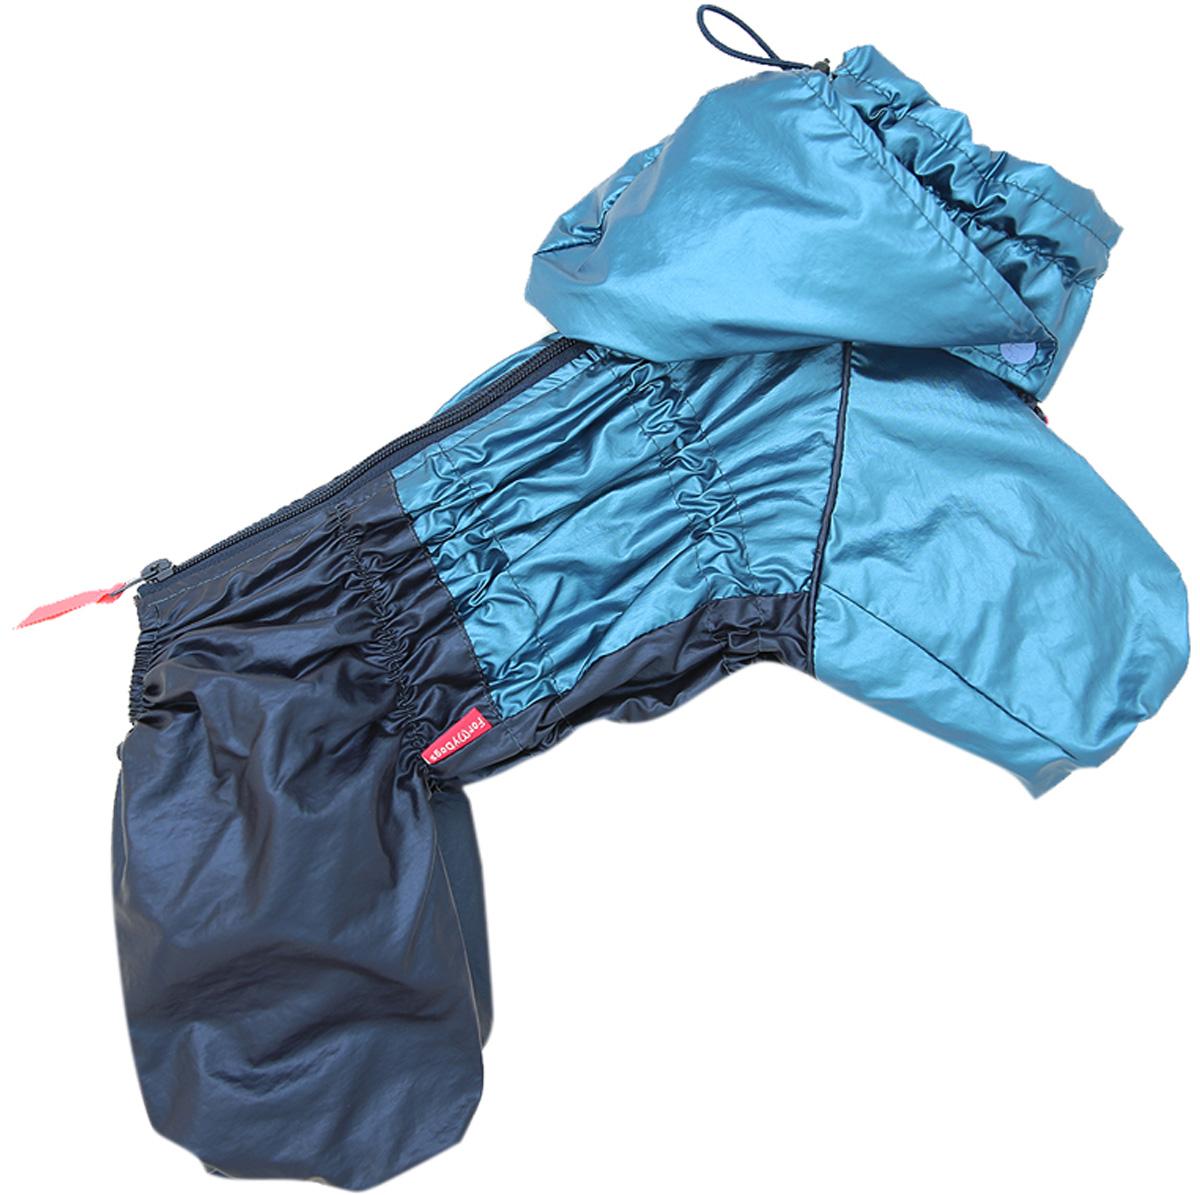 For My Dogs дождевик для собак синий металлик для мальчиков 430ss-2020 M (18)